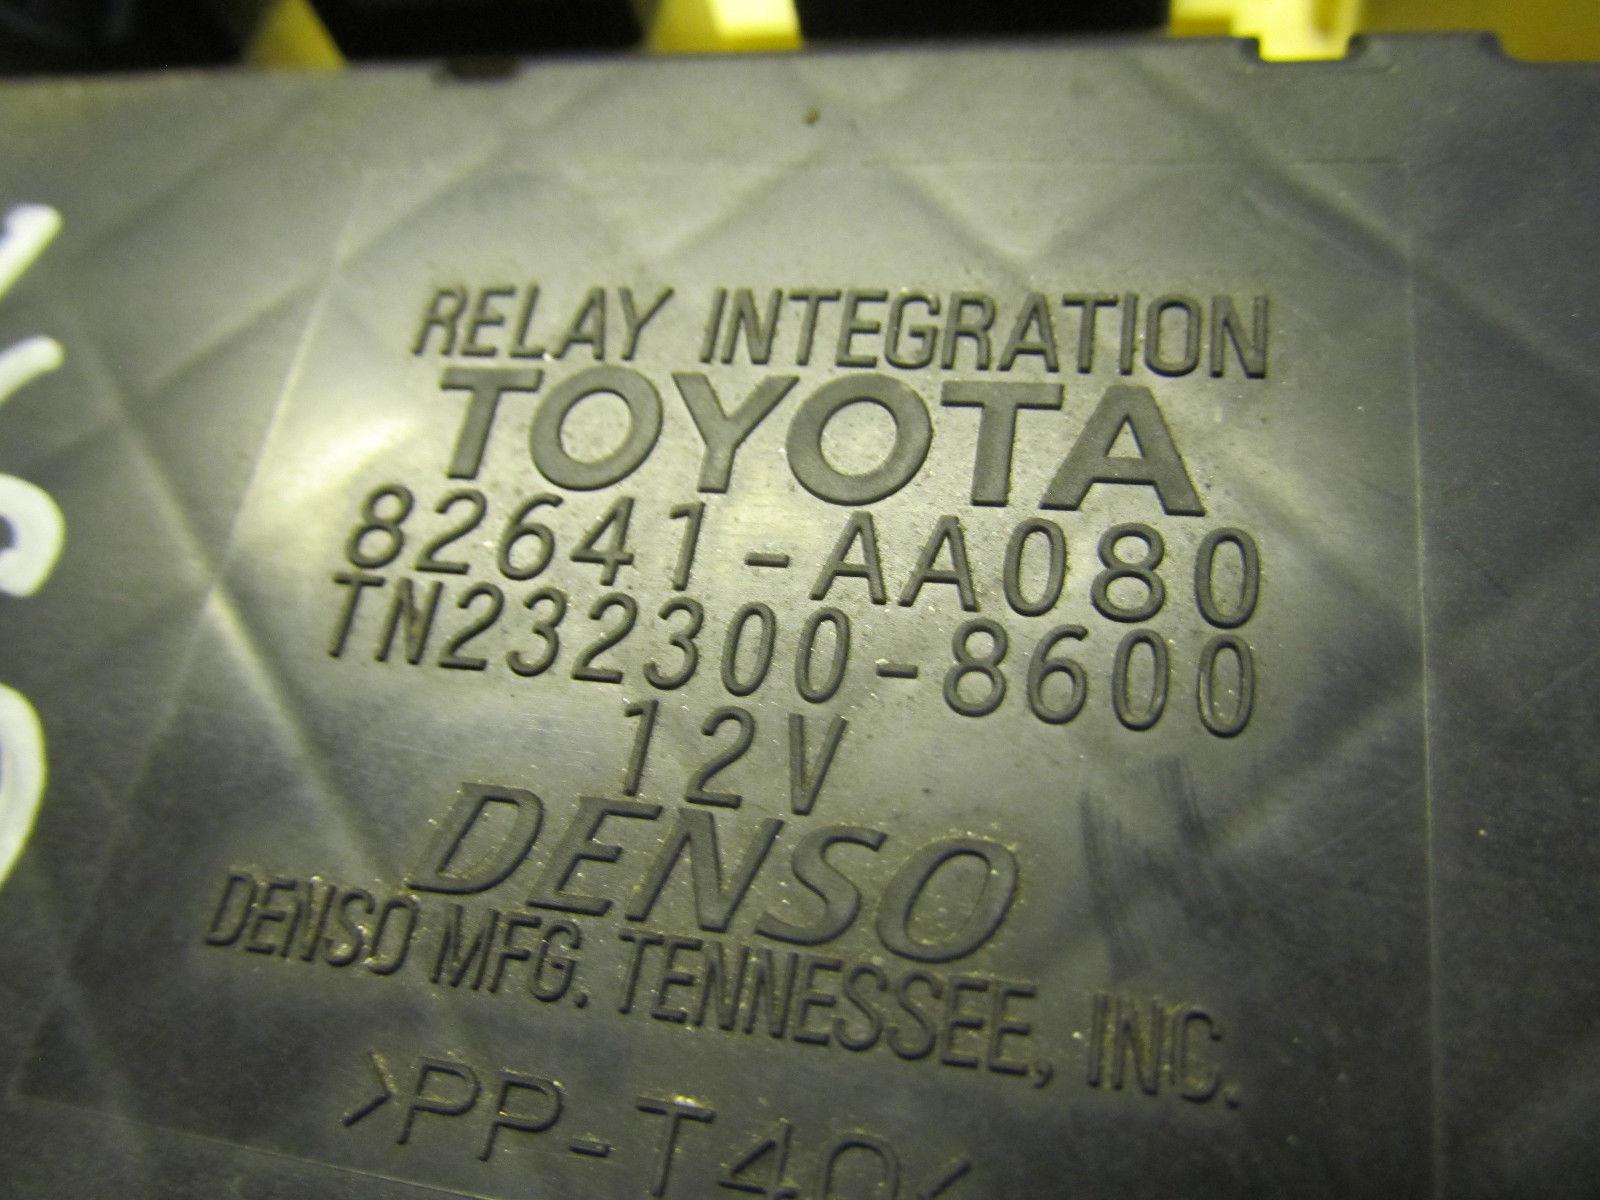 hight resolution of 01 03 02 toyota solara oem interior fuse box and 22 similar items fuse box vs